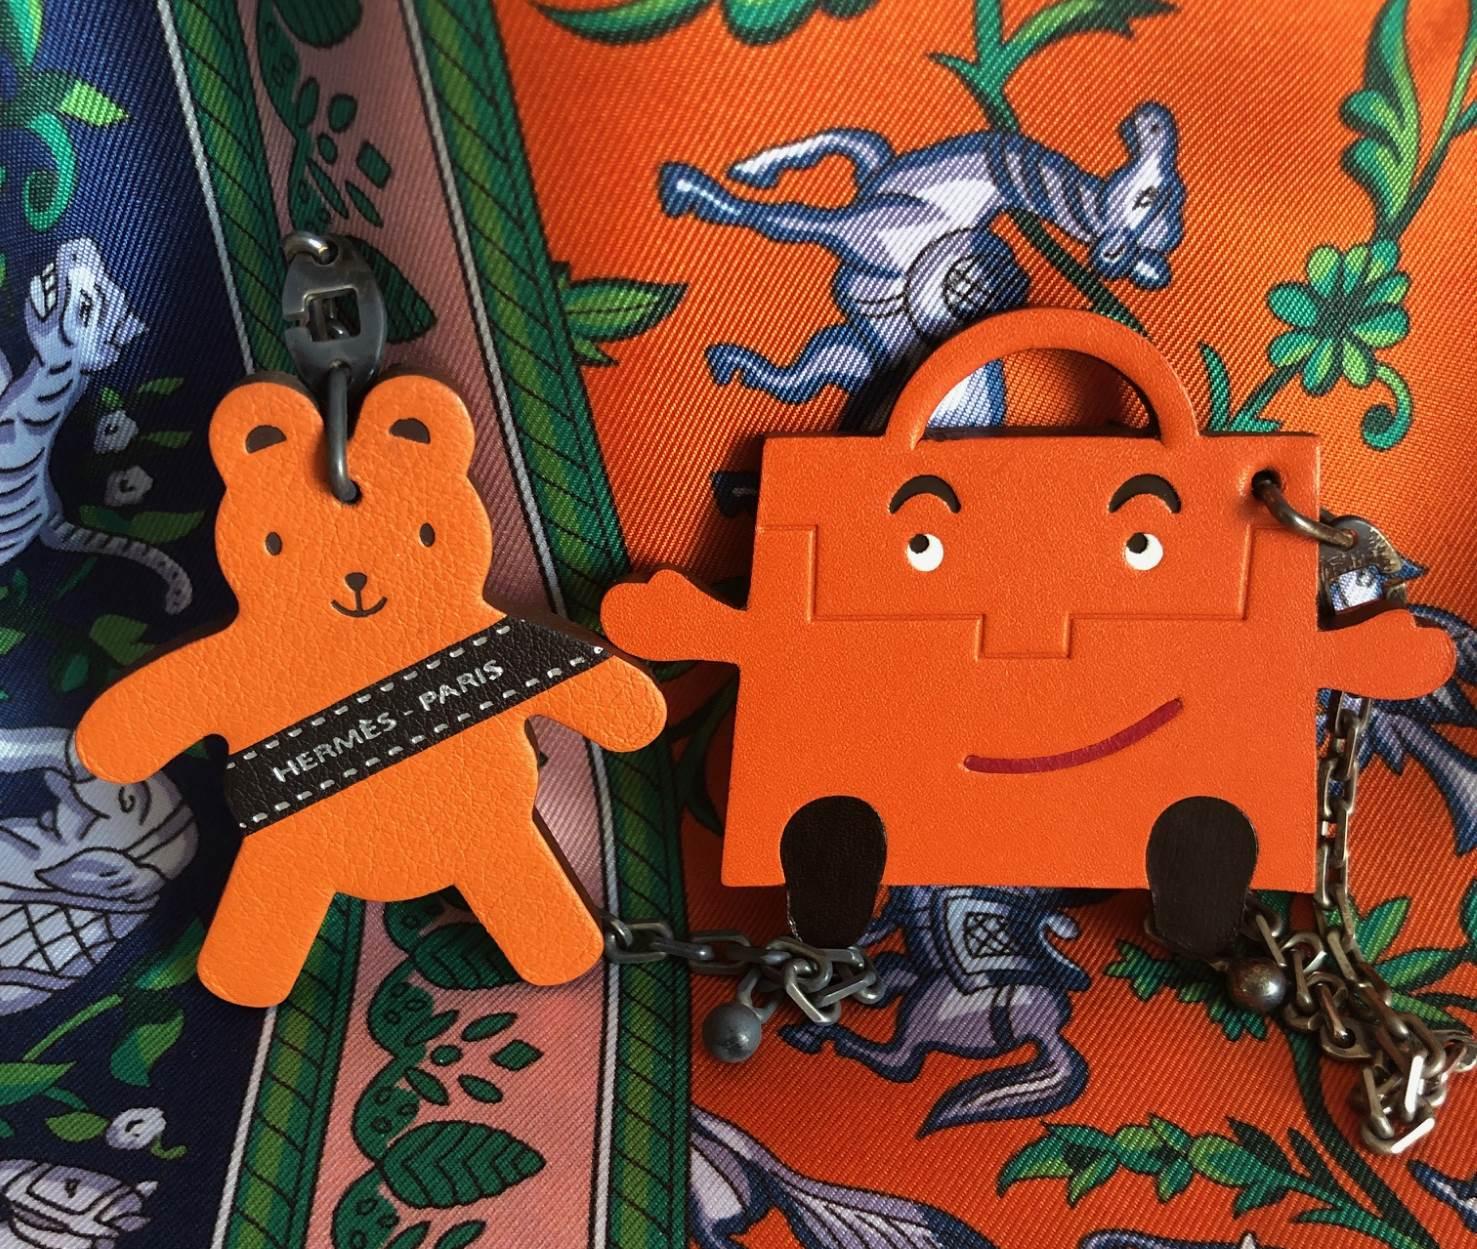 hermes key chaine bag charmes